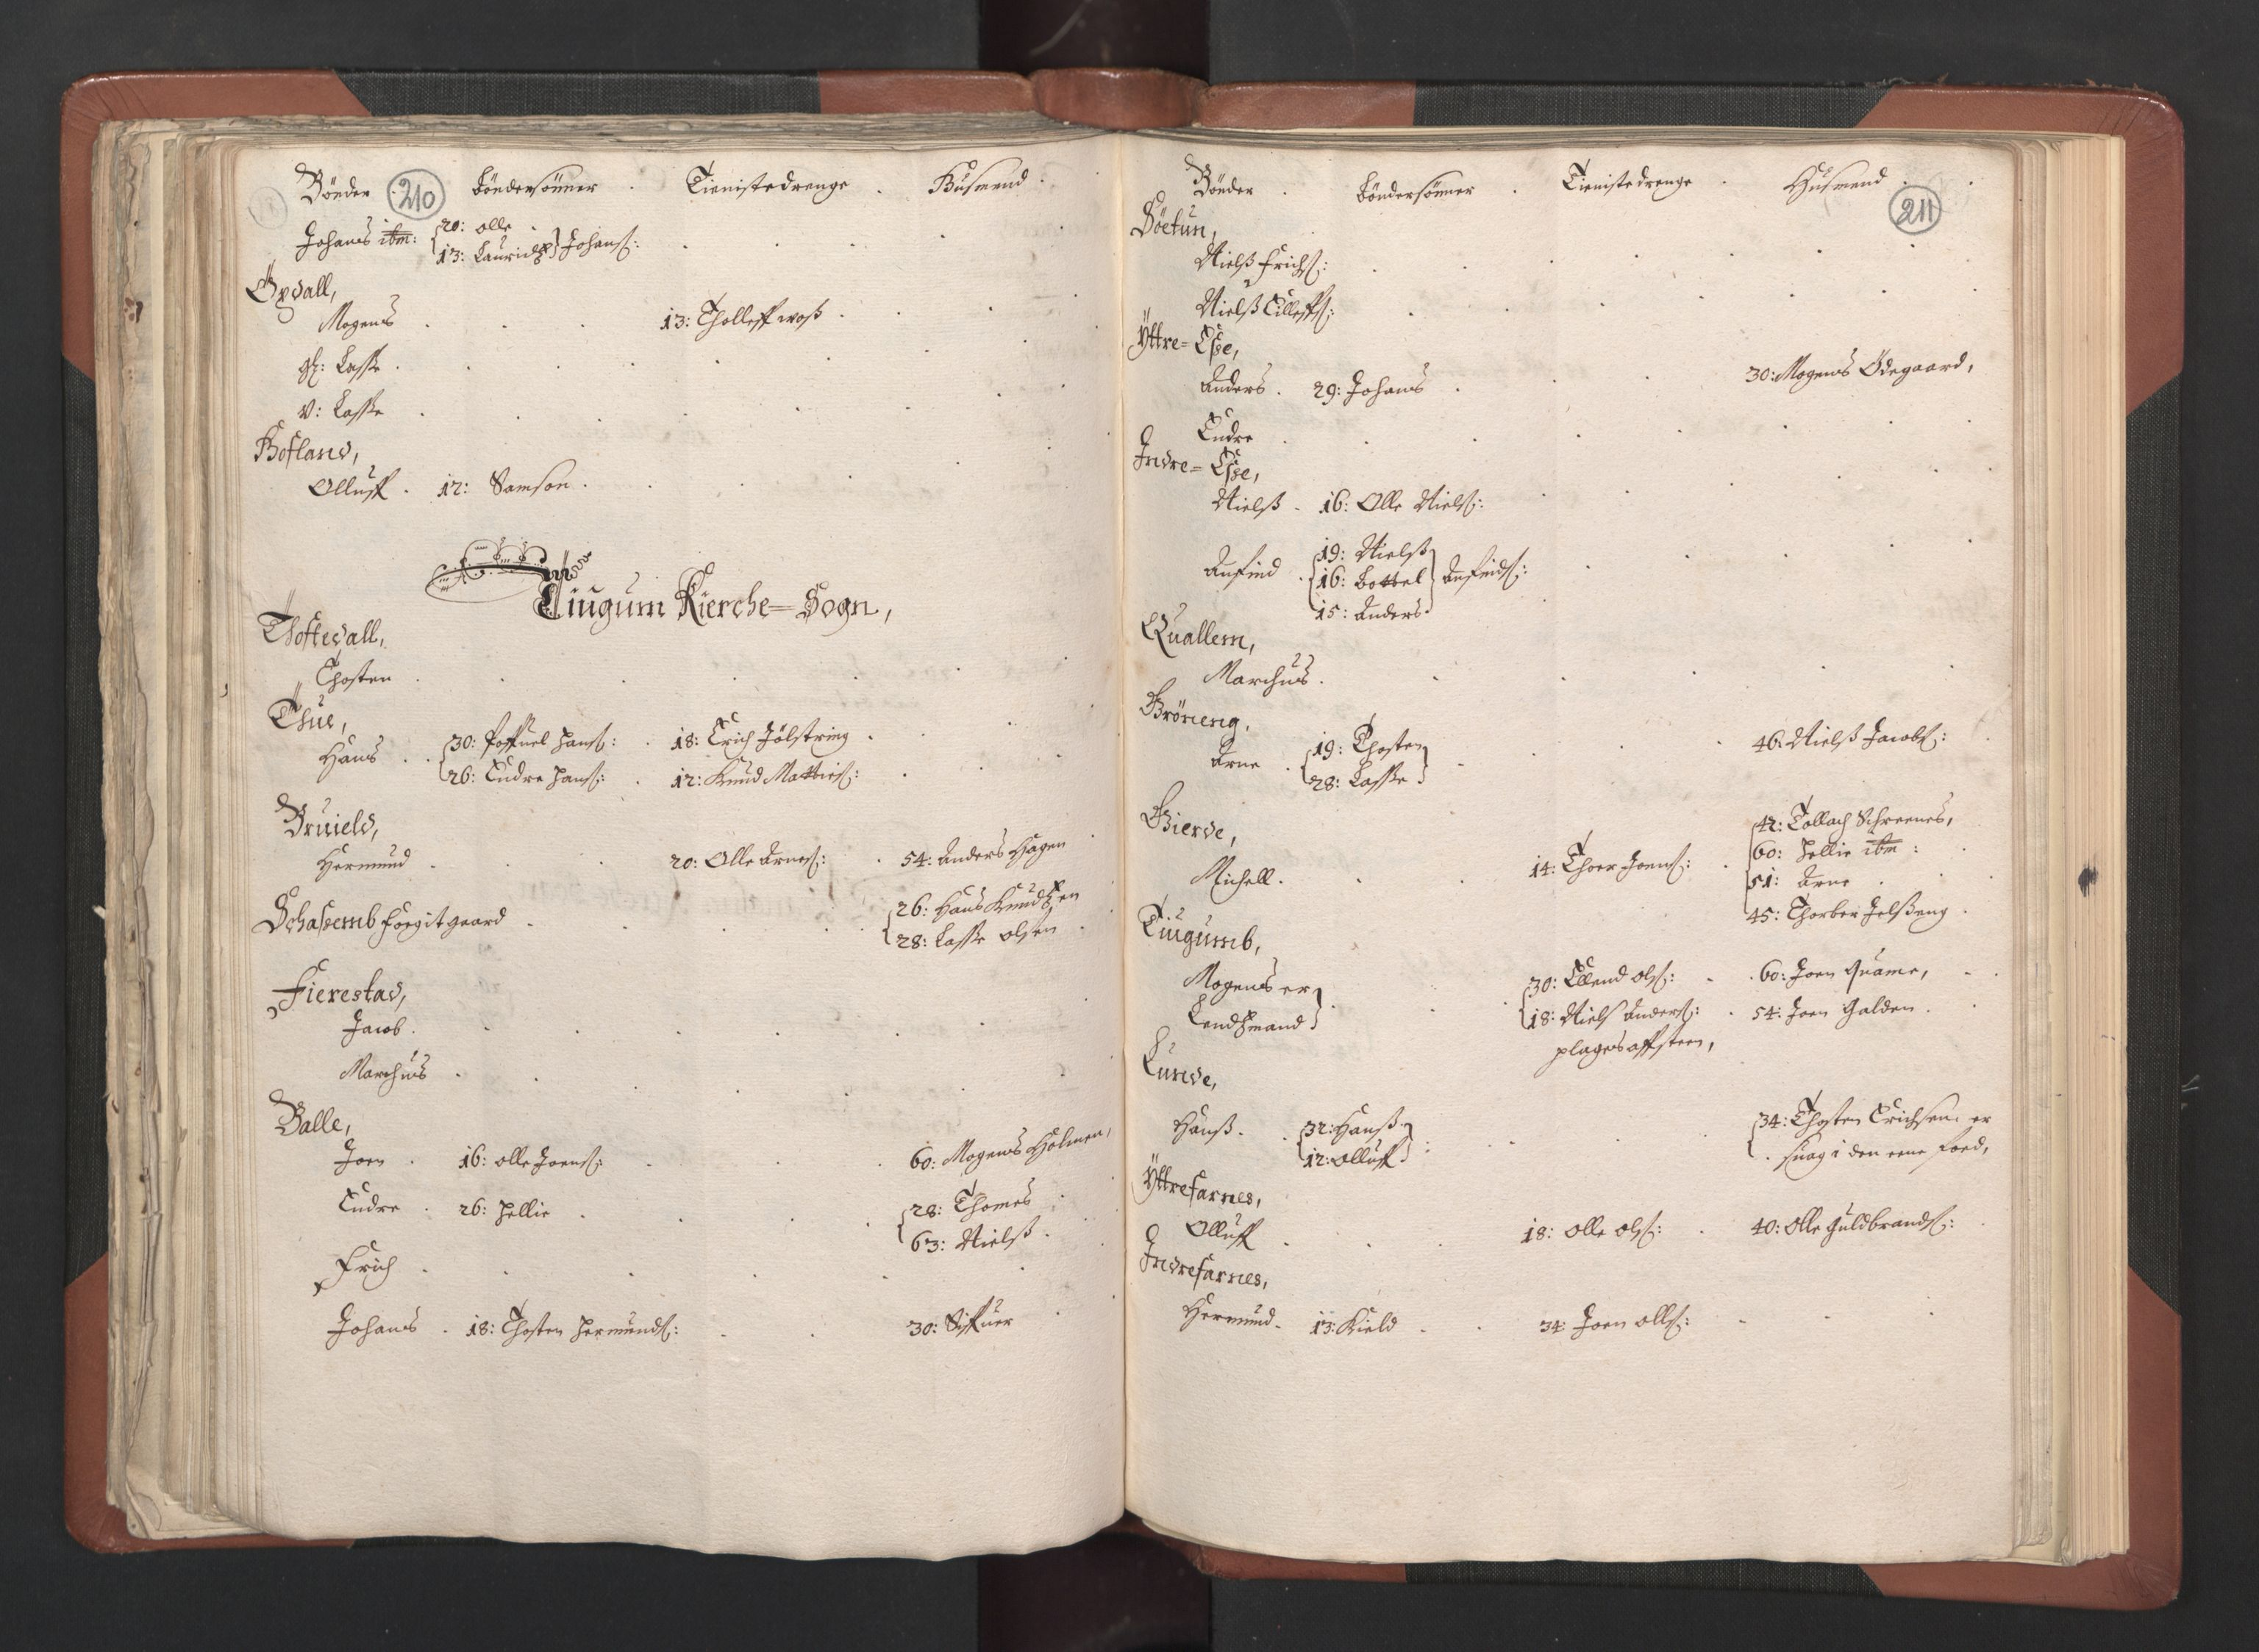 RA, Fogdenes og sorenskrivernes manntall 1664-1666, nr. 14: Hardanger len, Ytre Sogn fogderi og Indre Sogn fogderi, 1664-1665, s. 210-211